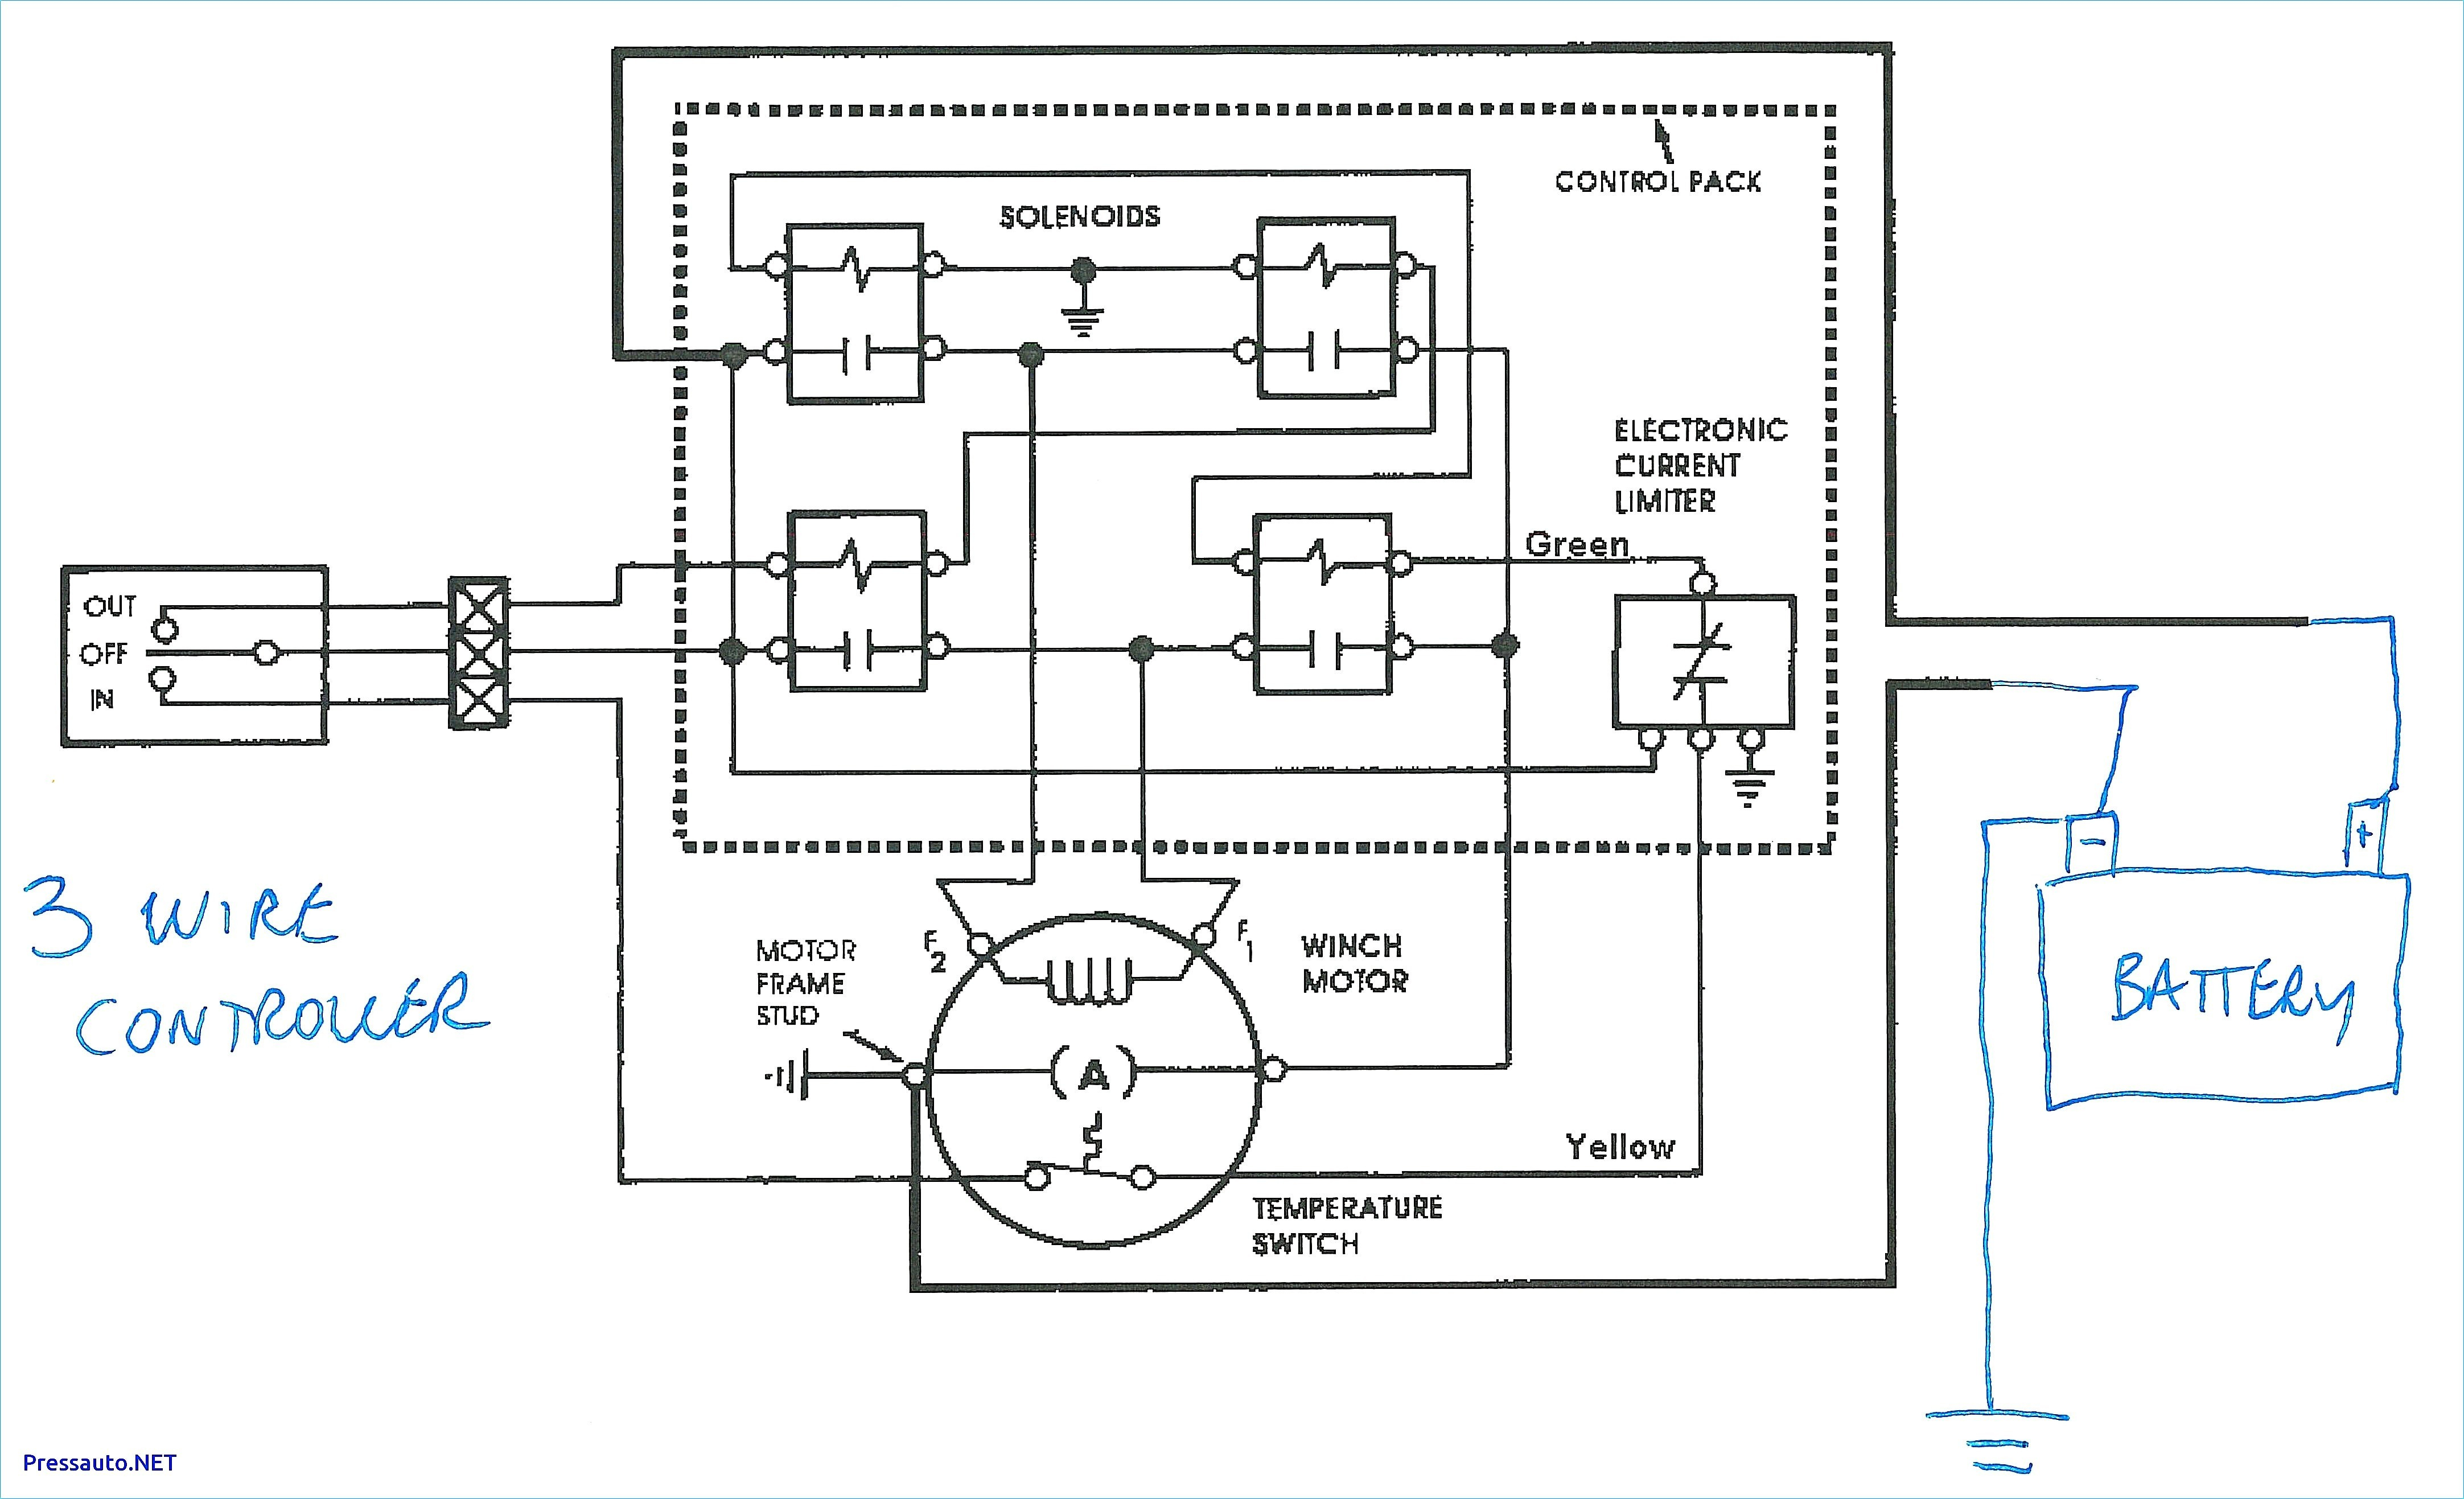 Warn Winch Wiring Diagram 4 solenoid Badland Winch Wiring Diagram Unique Warn 12k Winch Wiring